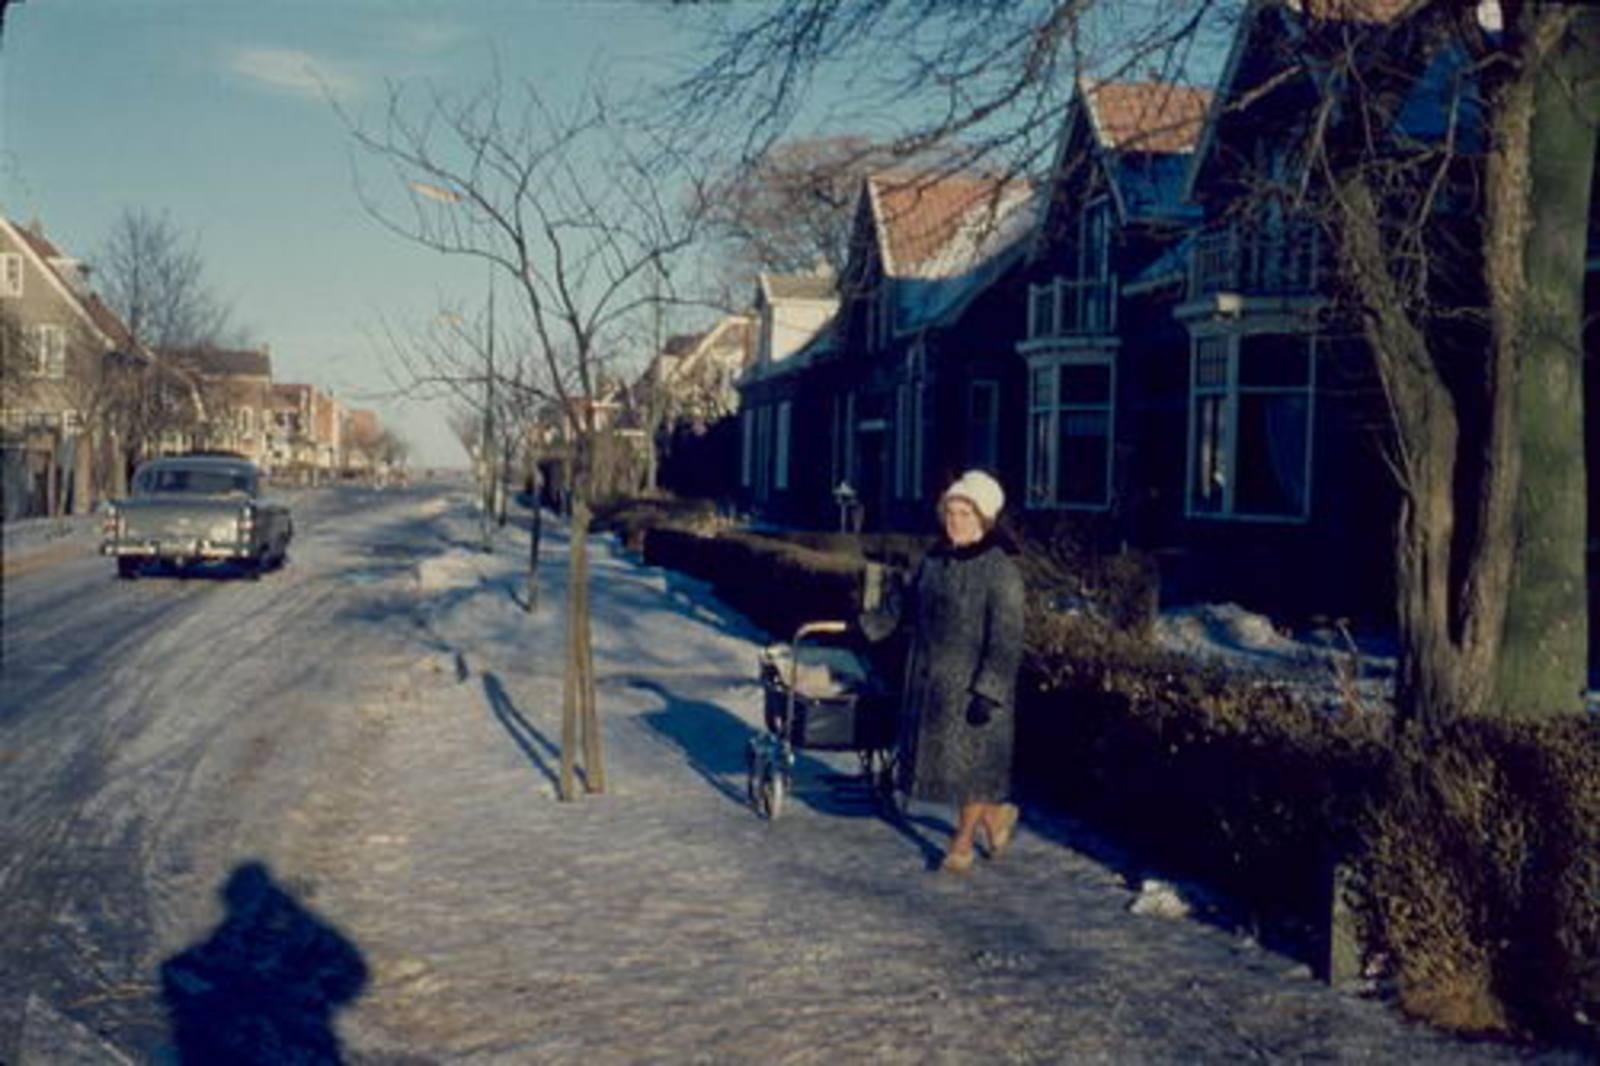 Nieuweweg O 0056- 1962± Huize Kemp met mw Mannessen